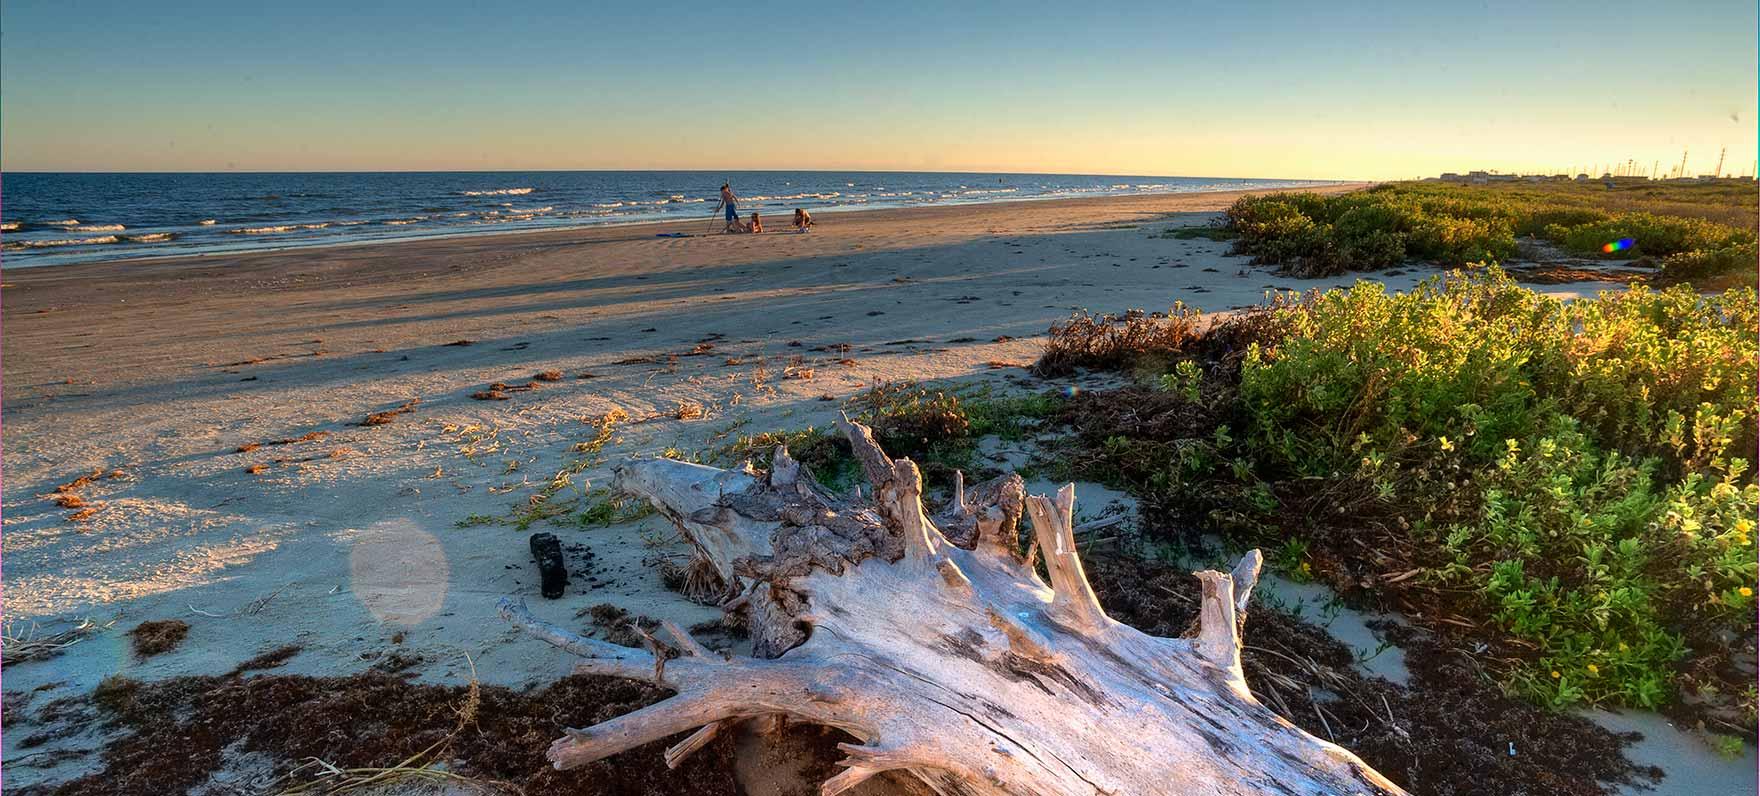 Galveston Island beach